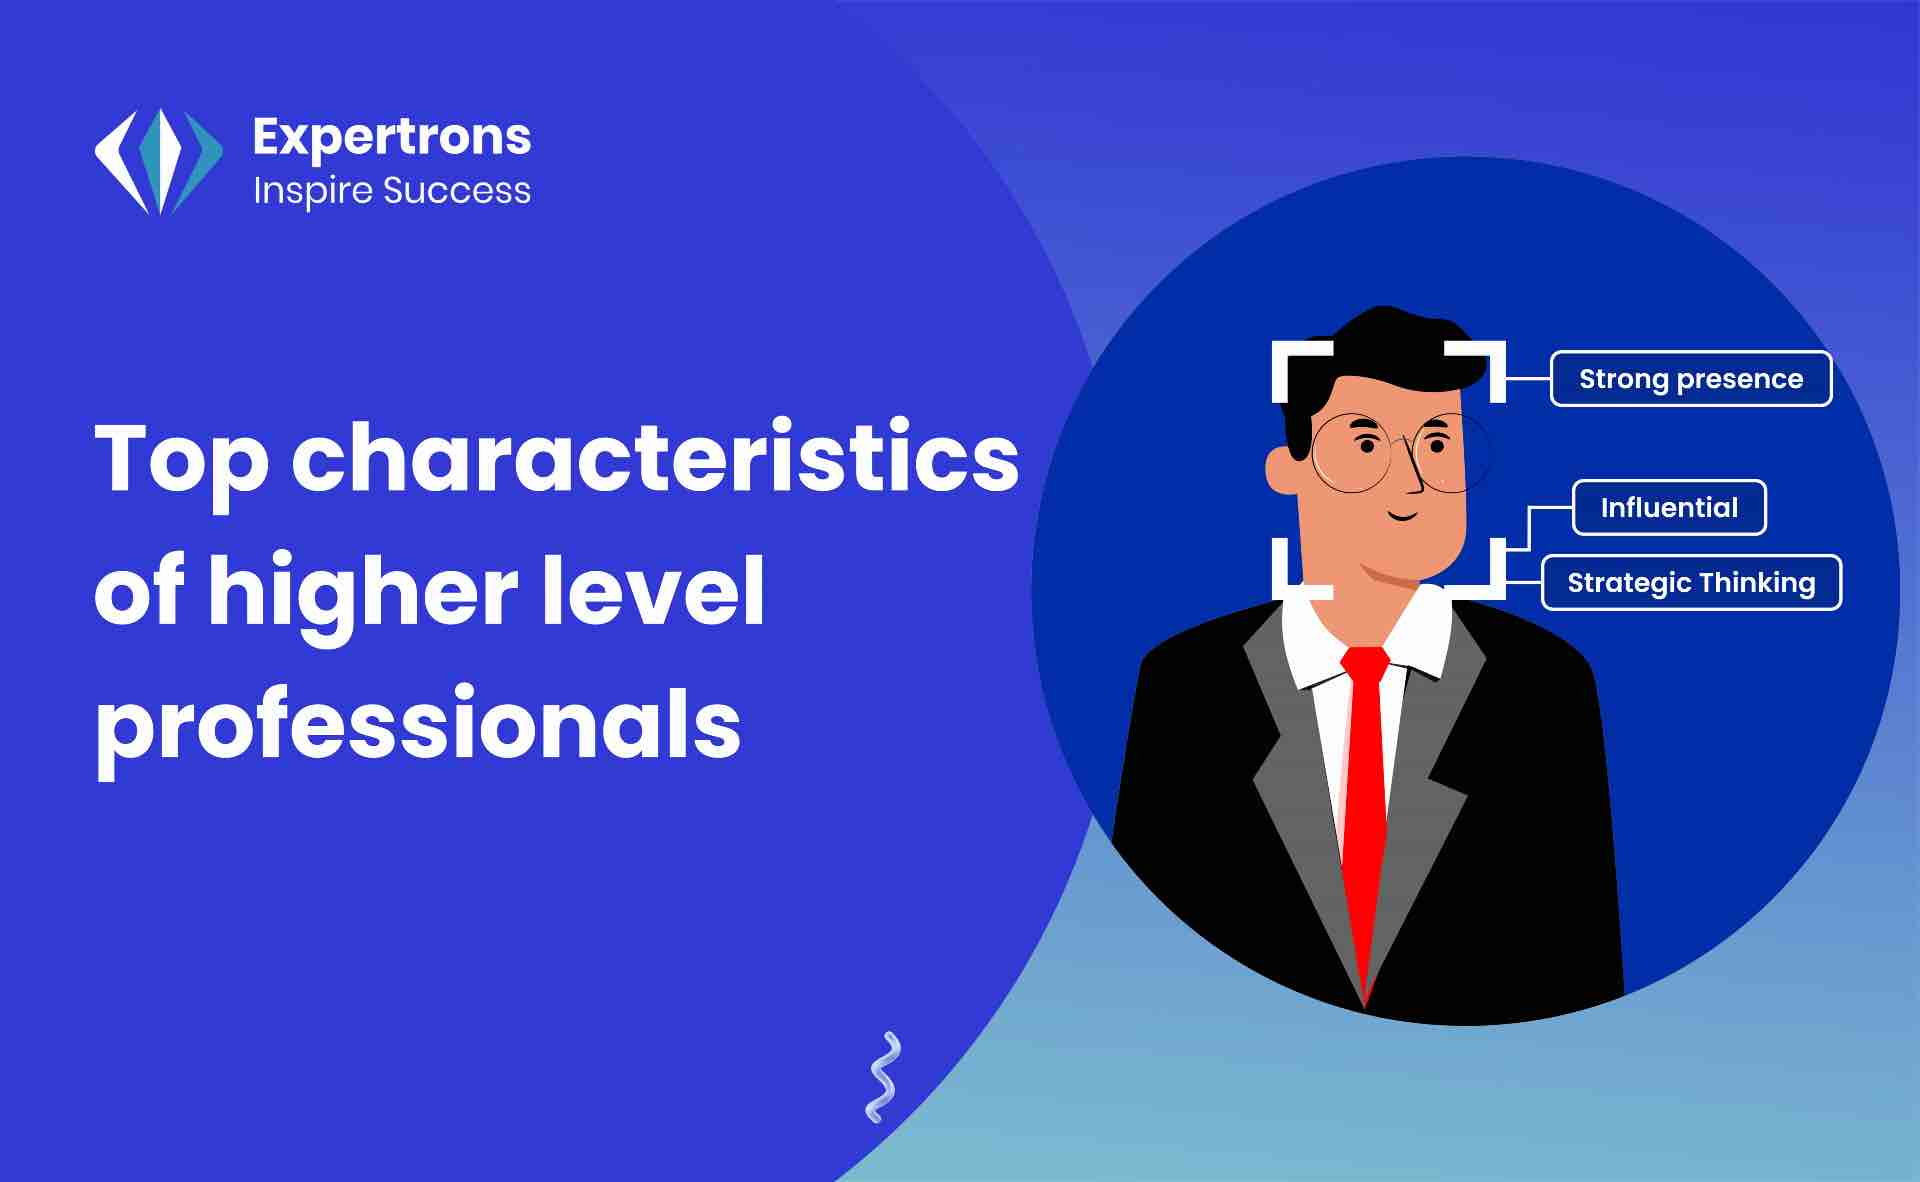 Strategic Thinking Skills, proverbial career ladder, career guidance, leadership skills, Career Transformation, Career Guidance Expert, career development, Career Counselling.